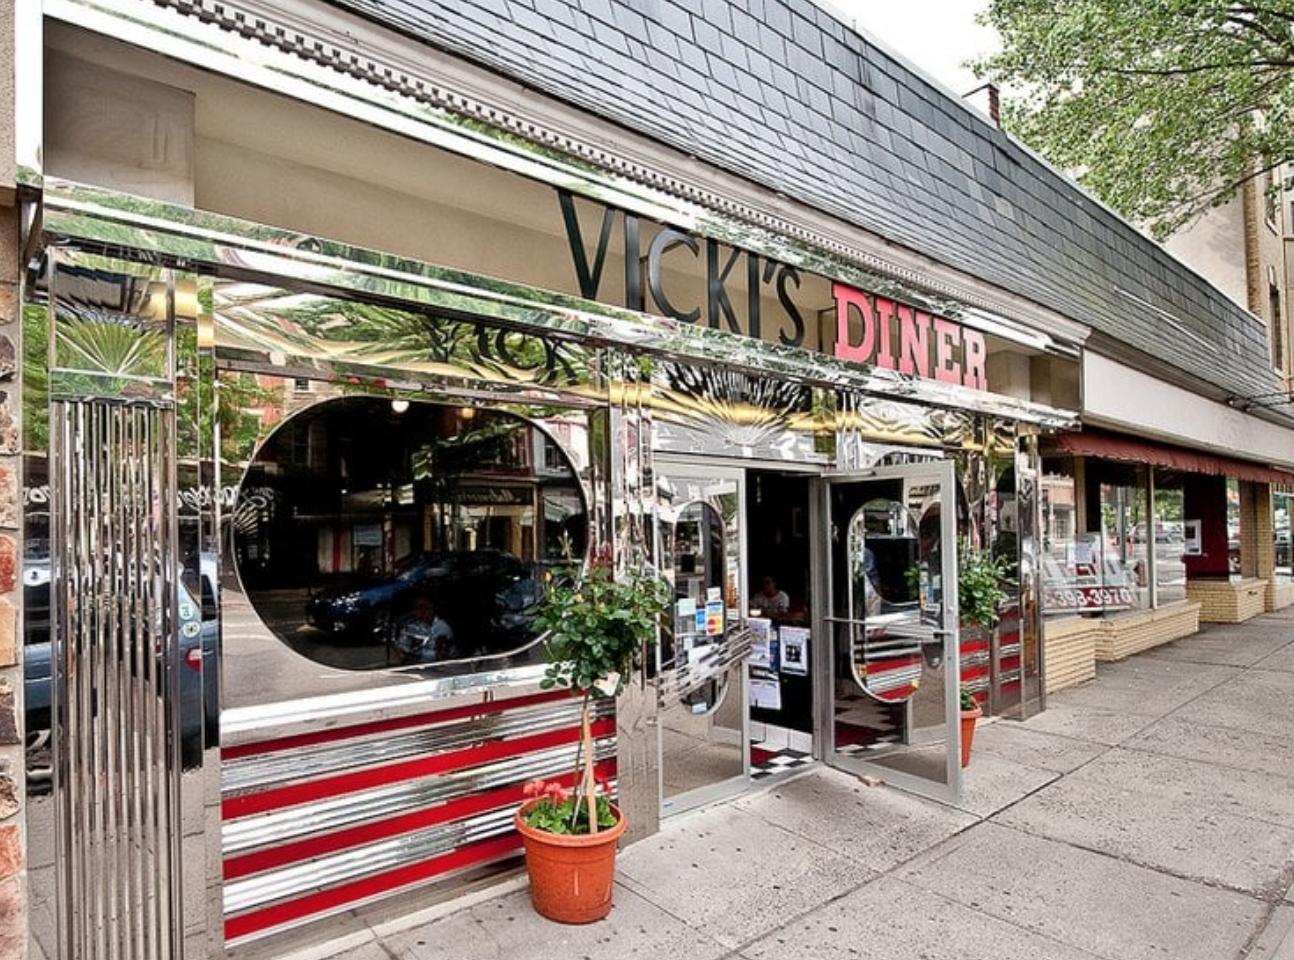 Vicki's Diner Westfield